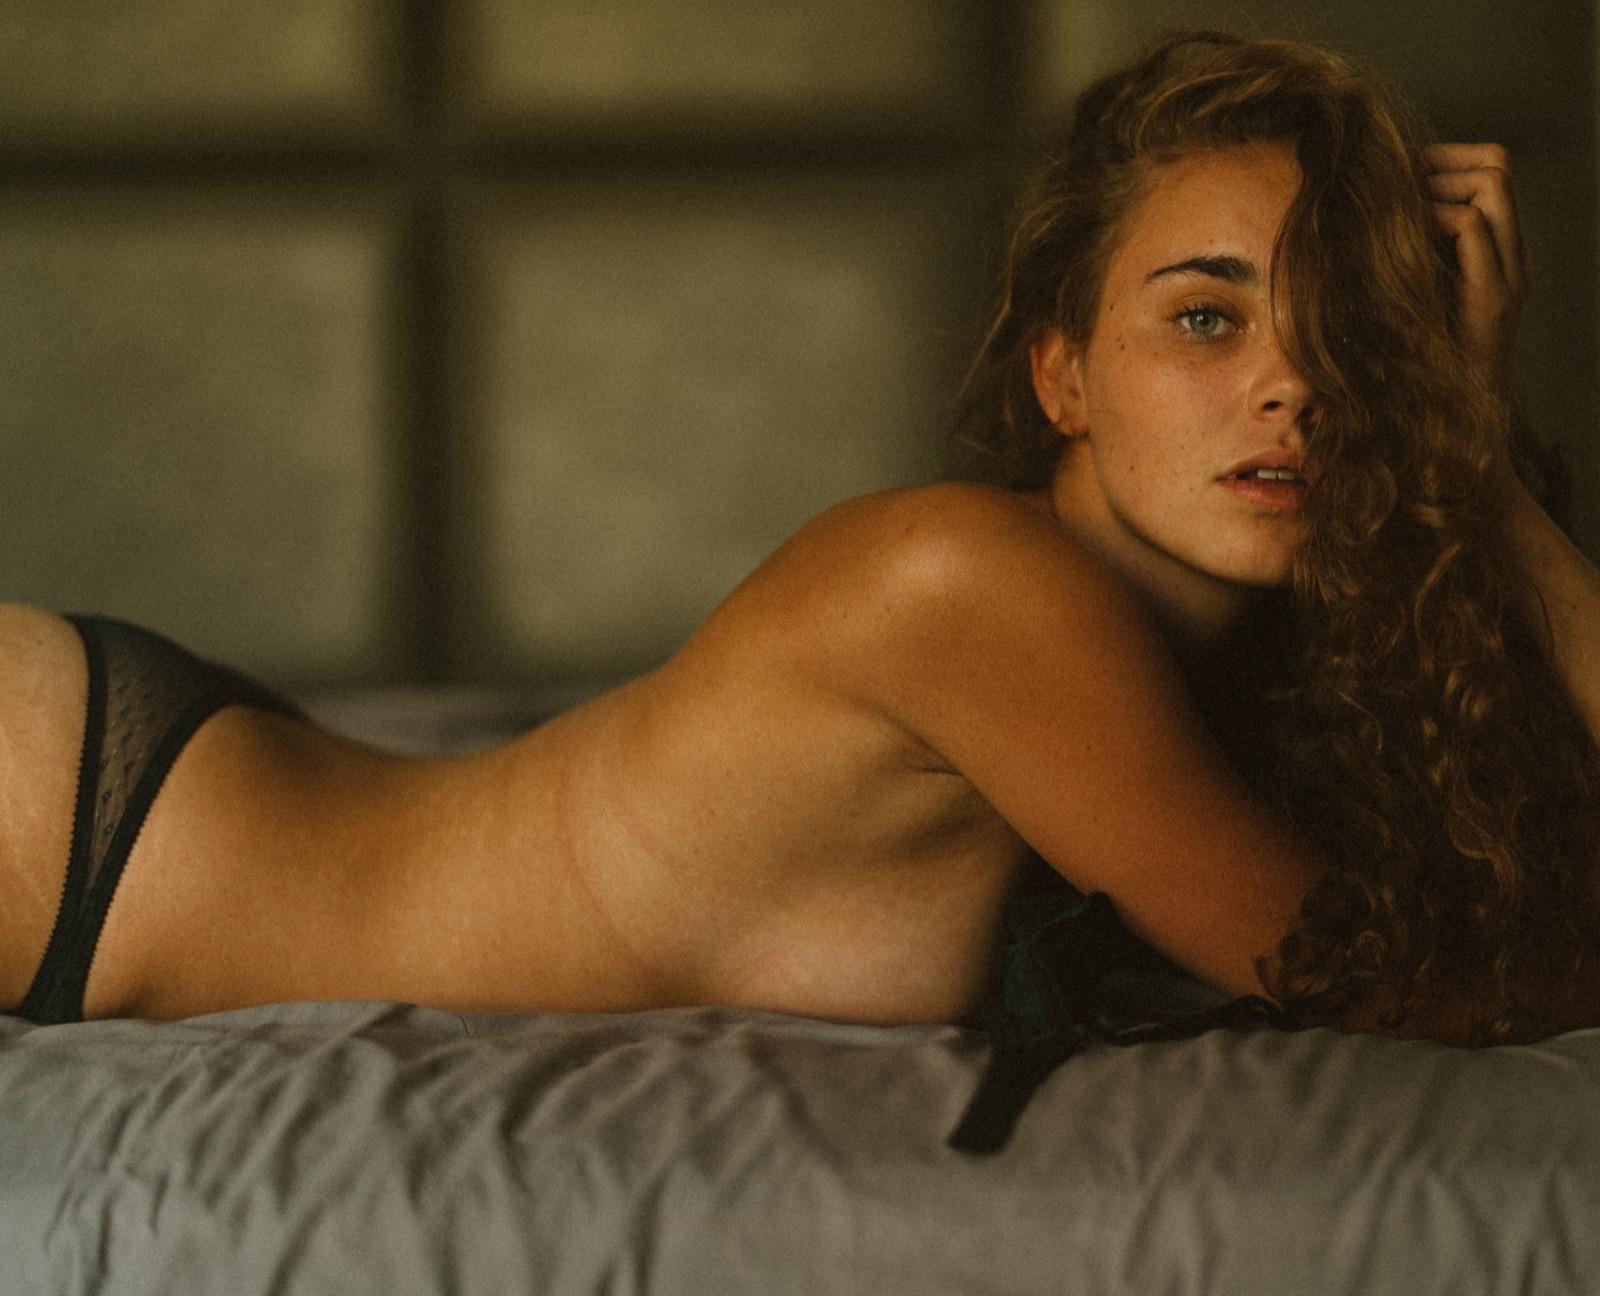 Shanta De Keuning Tits